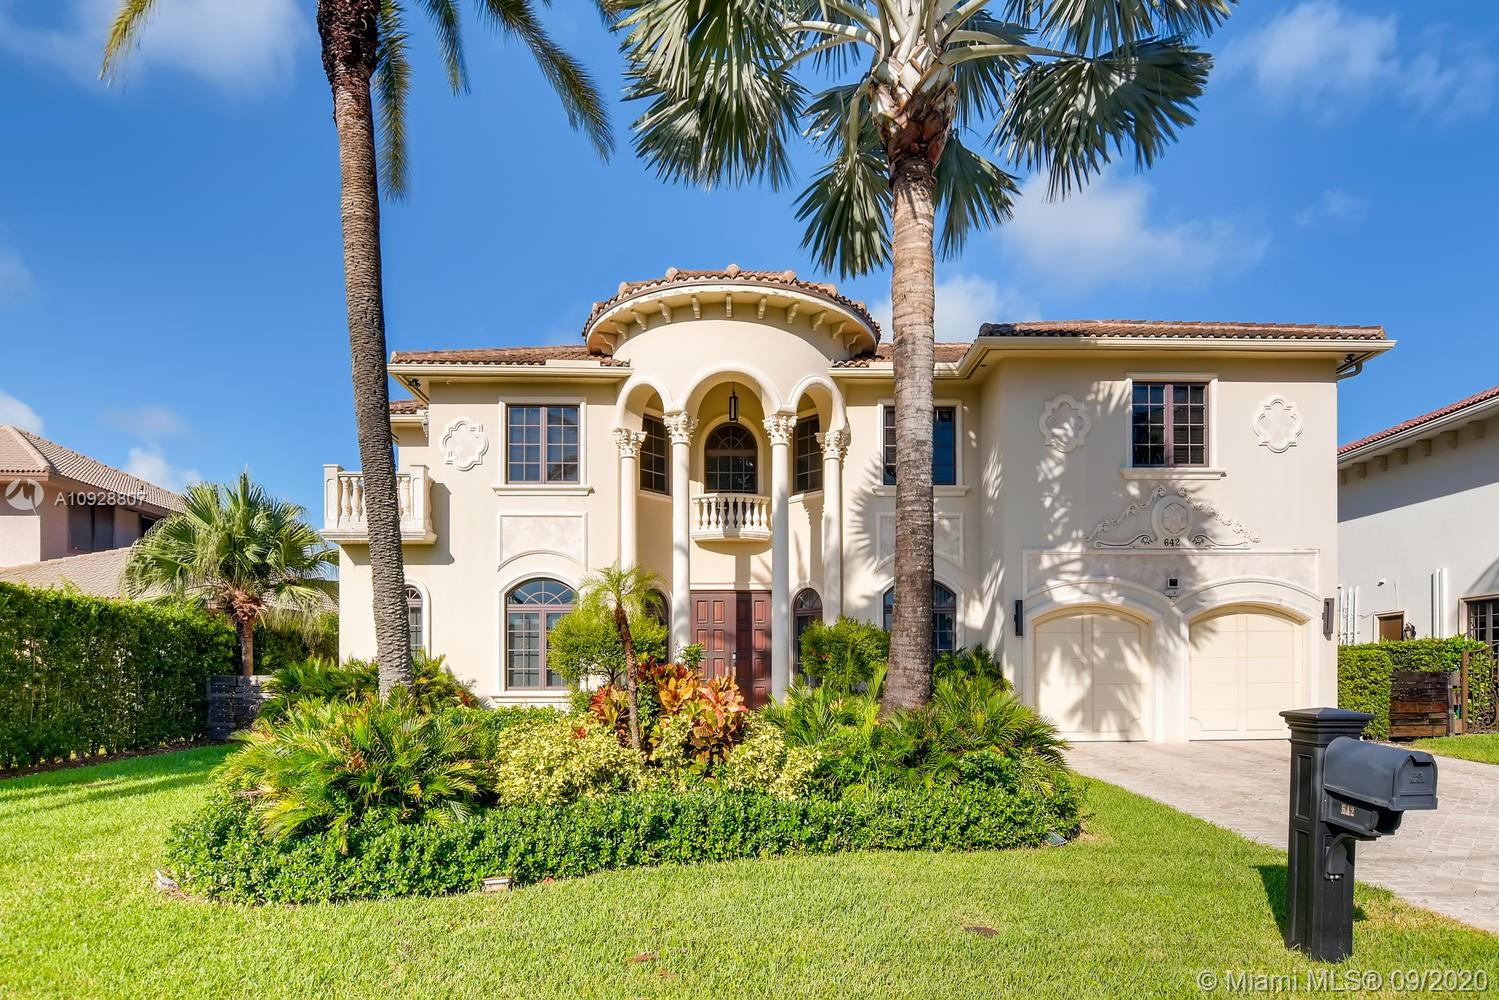 Golden Isles, 642 Palm Dr, Hallandale Beach, Florida 33009